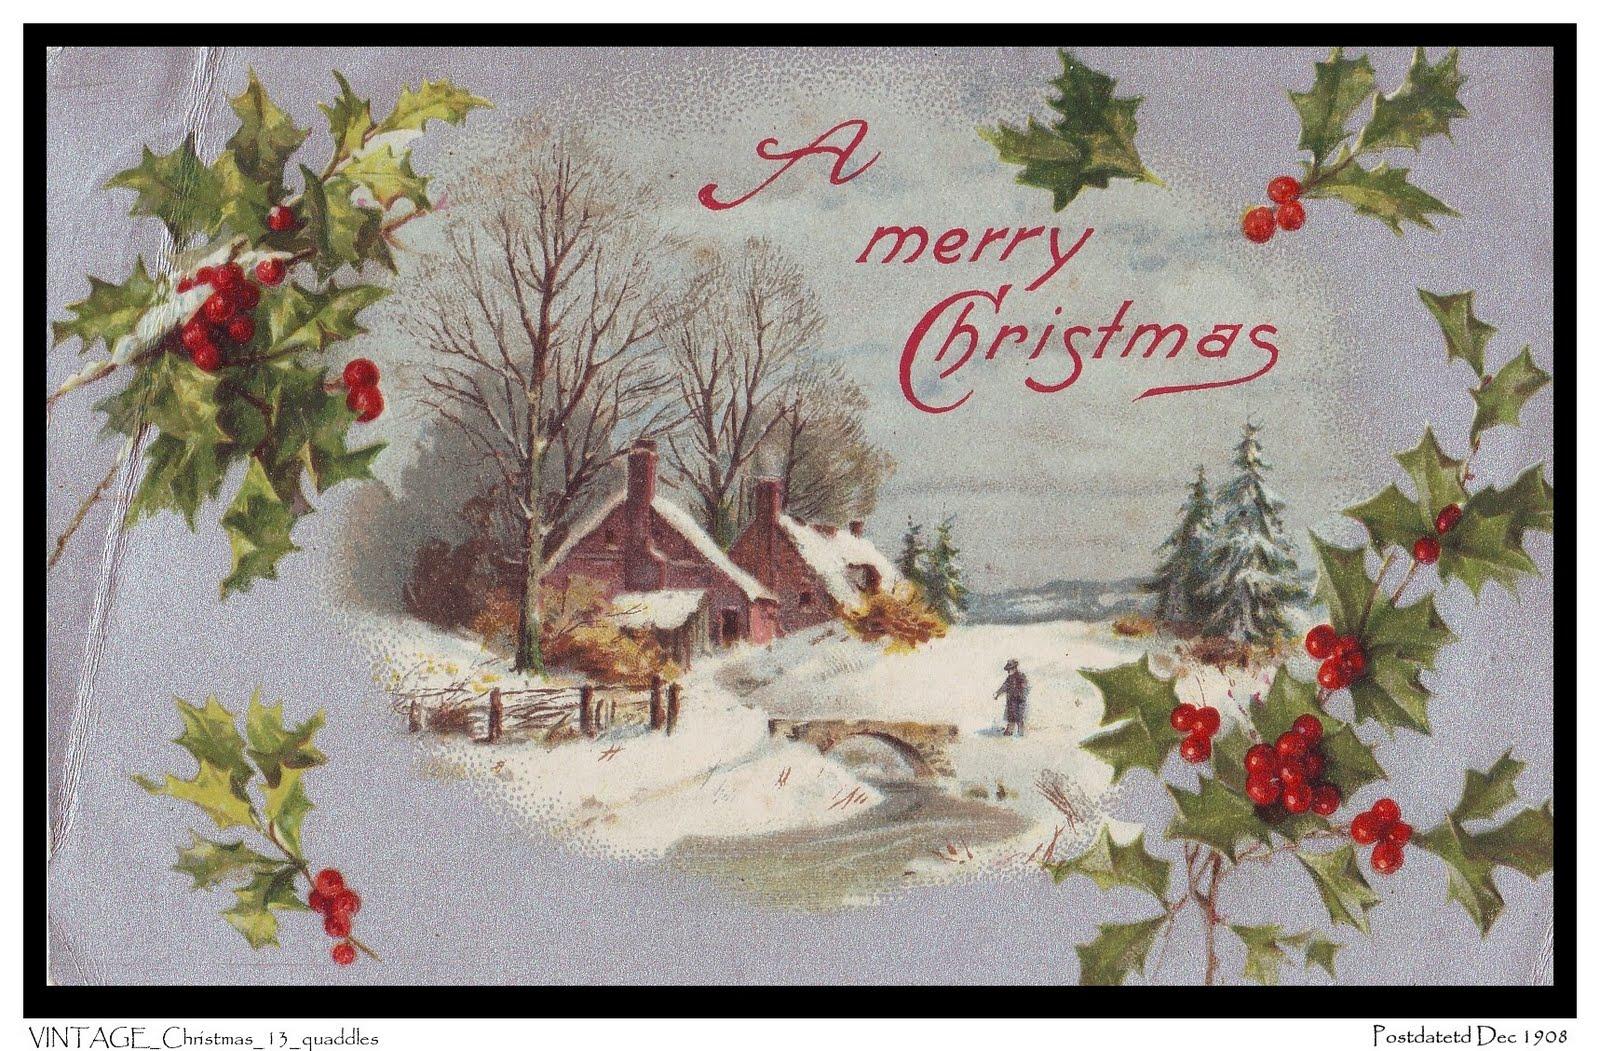 Vintage holiday wallpaper